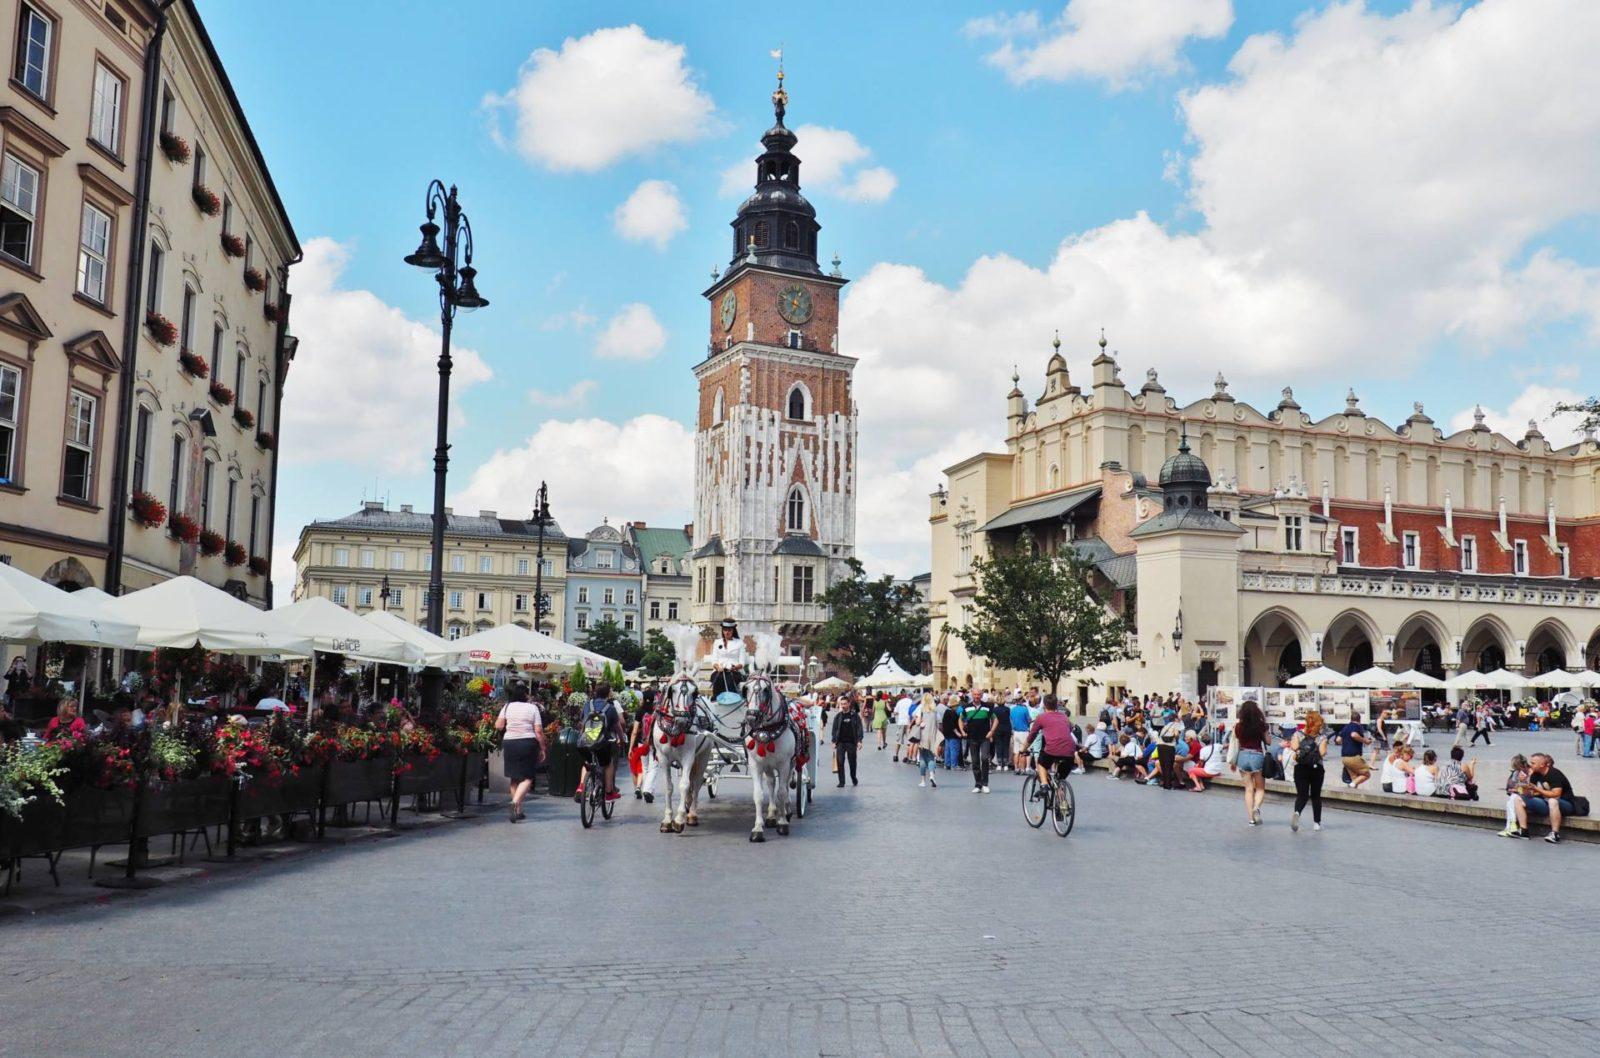 Emma Victoria Stokes Krakow Main Square Old Town